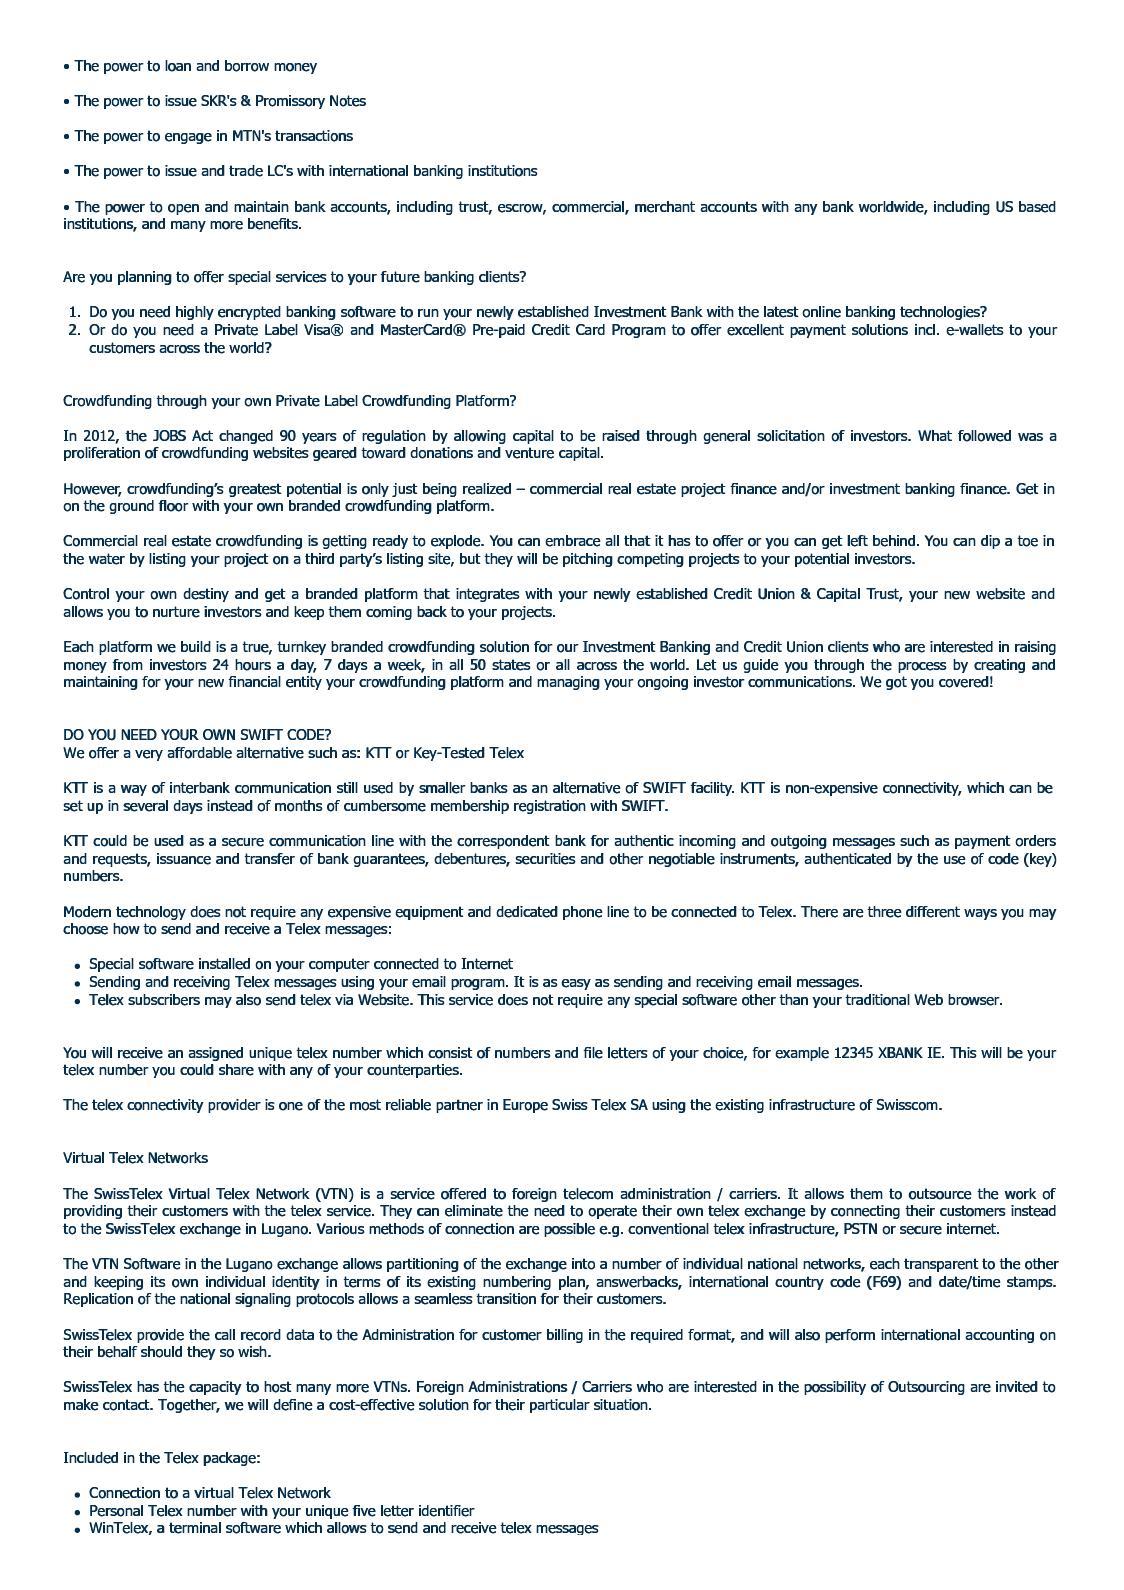 US Bancorp & Capital Trust - CALAMEO Downloader